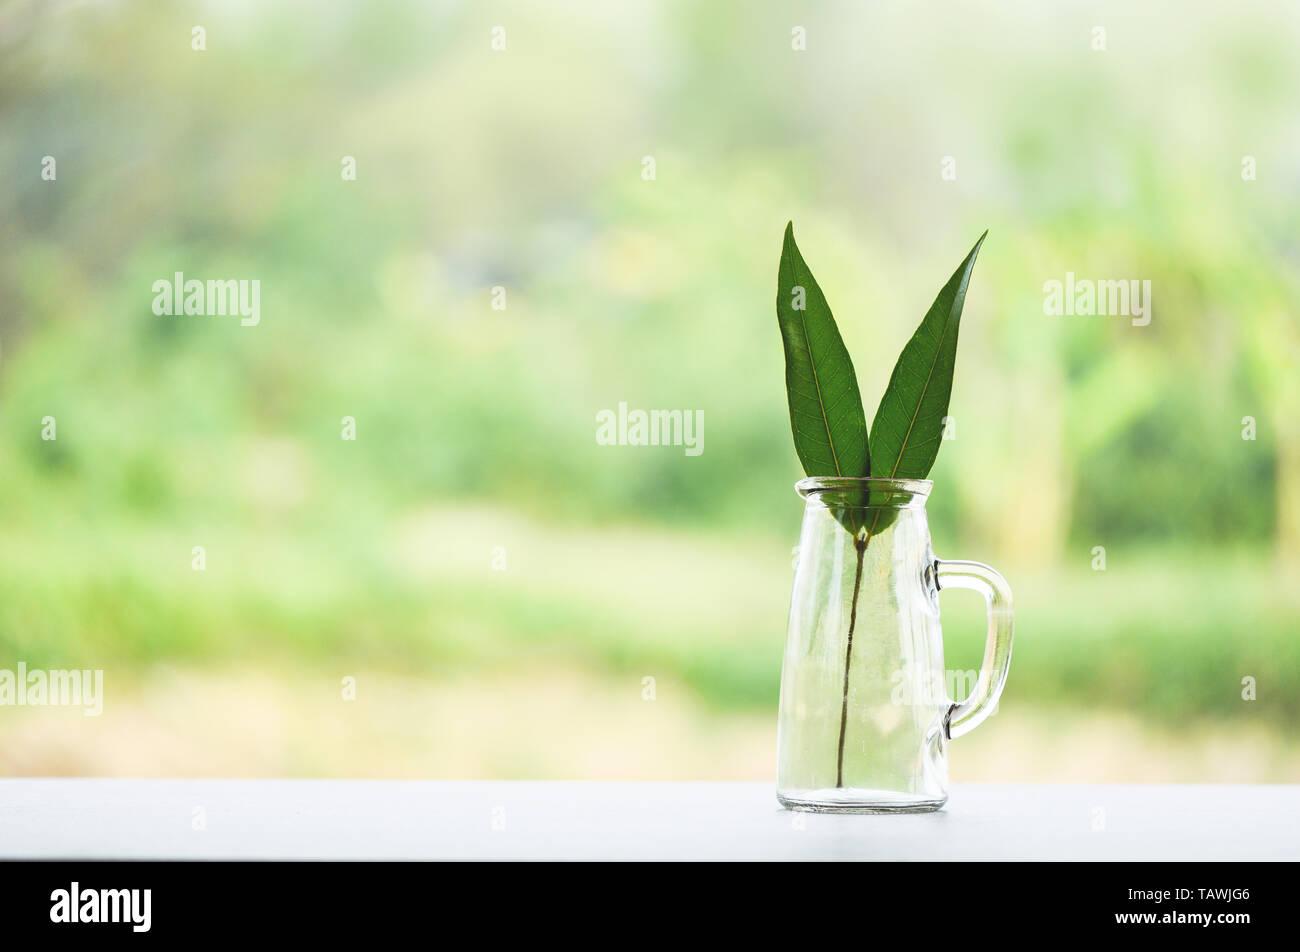 Zero Waste Use Less Plastic Concept Eco Green Leaf In